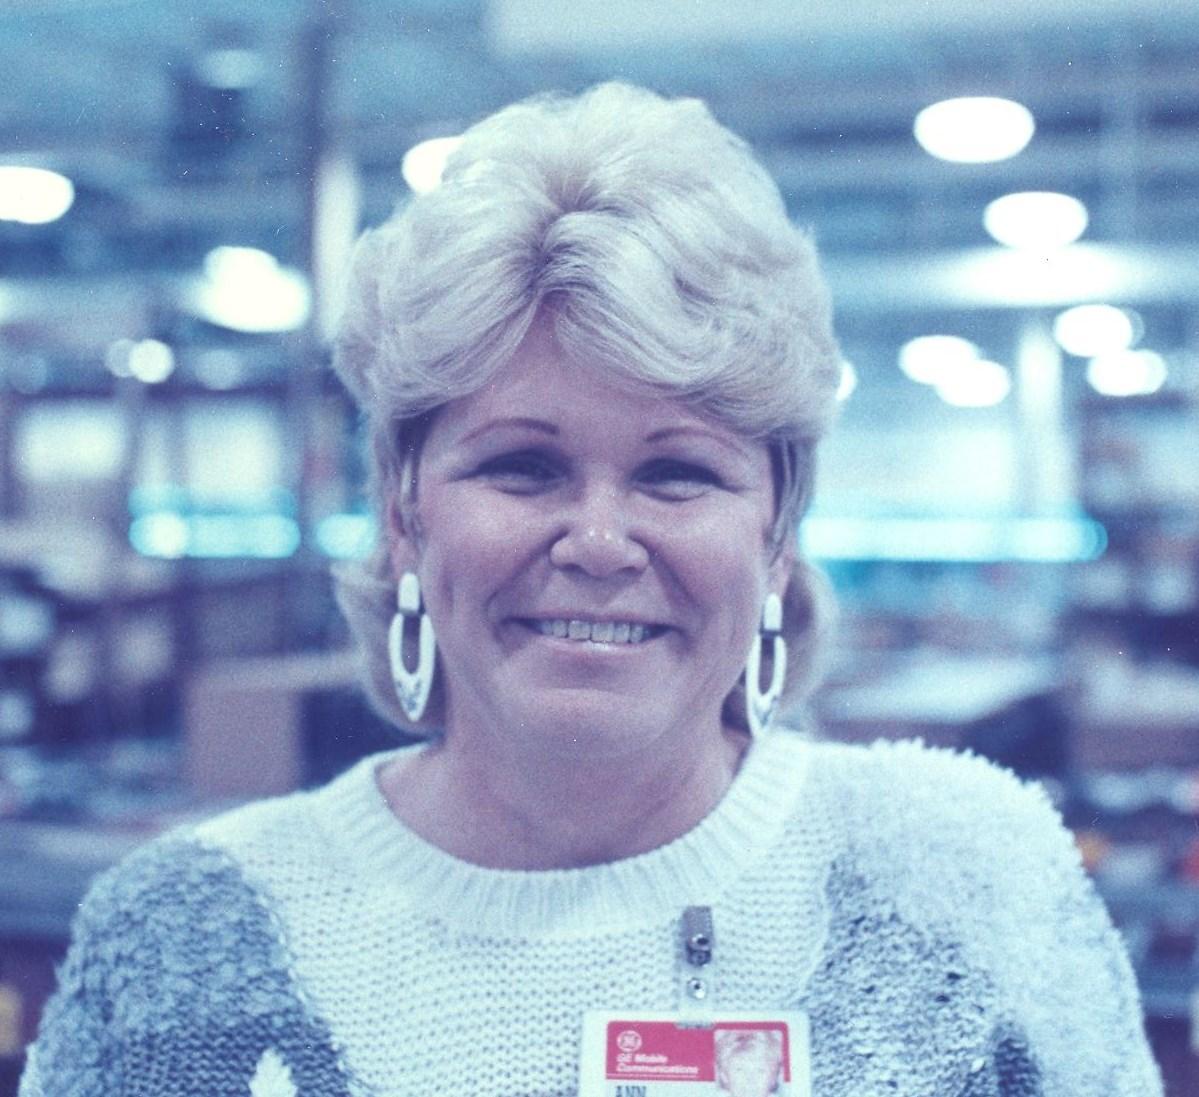 Irene Dailey,Marilu Henner born April 6, 1952 (age 66) XXX archive Courtney Eaton,Dorothy Meyer